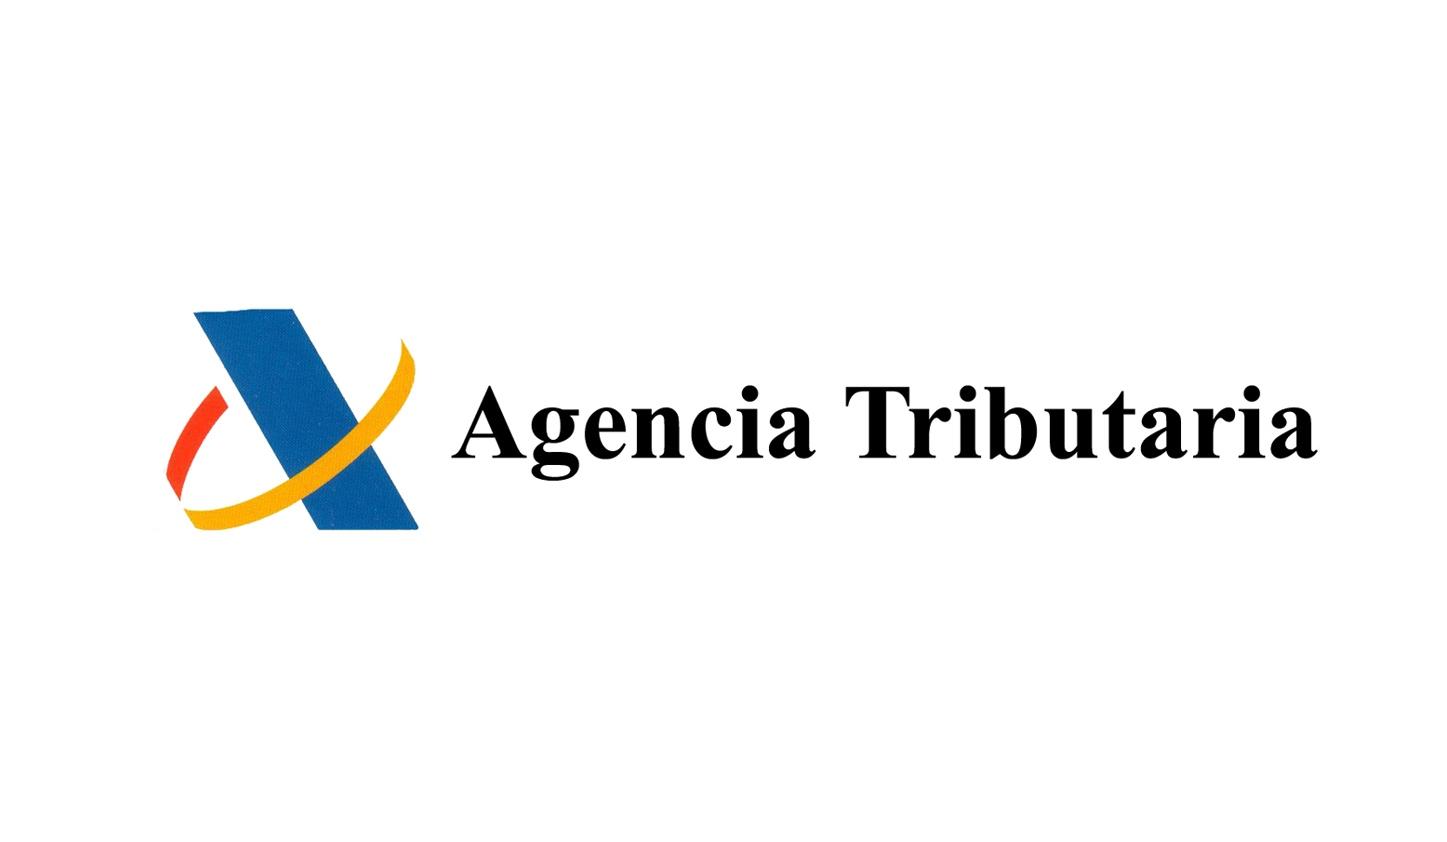 La Agencia Tributaria Espanola